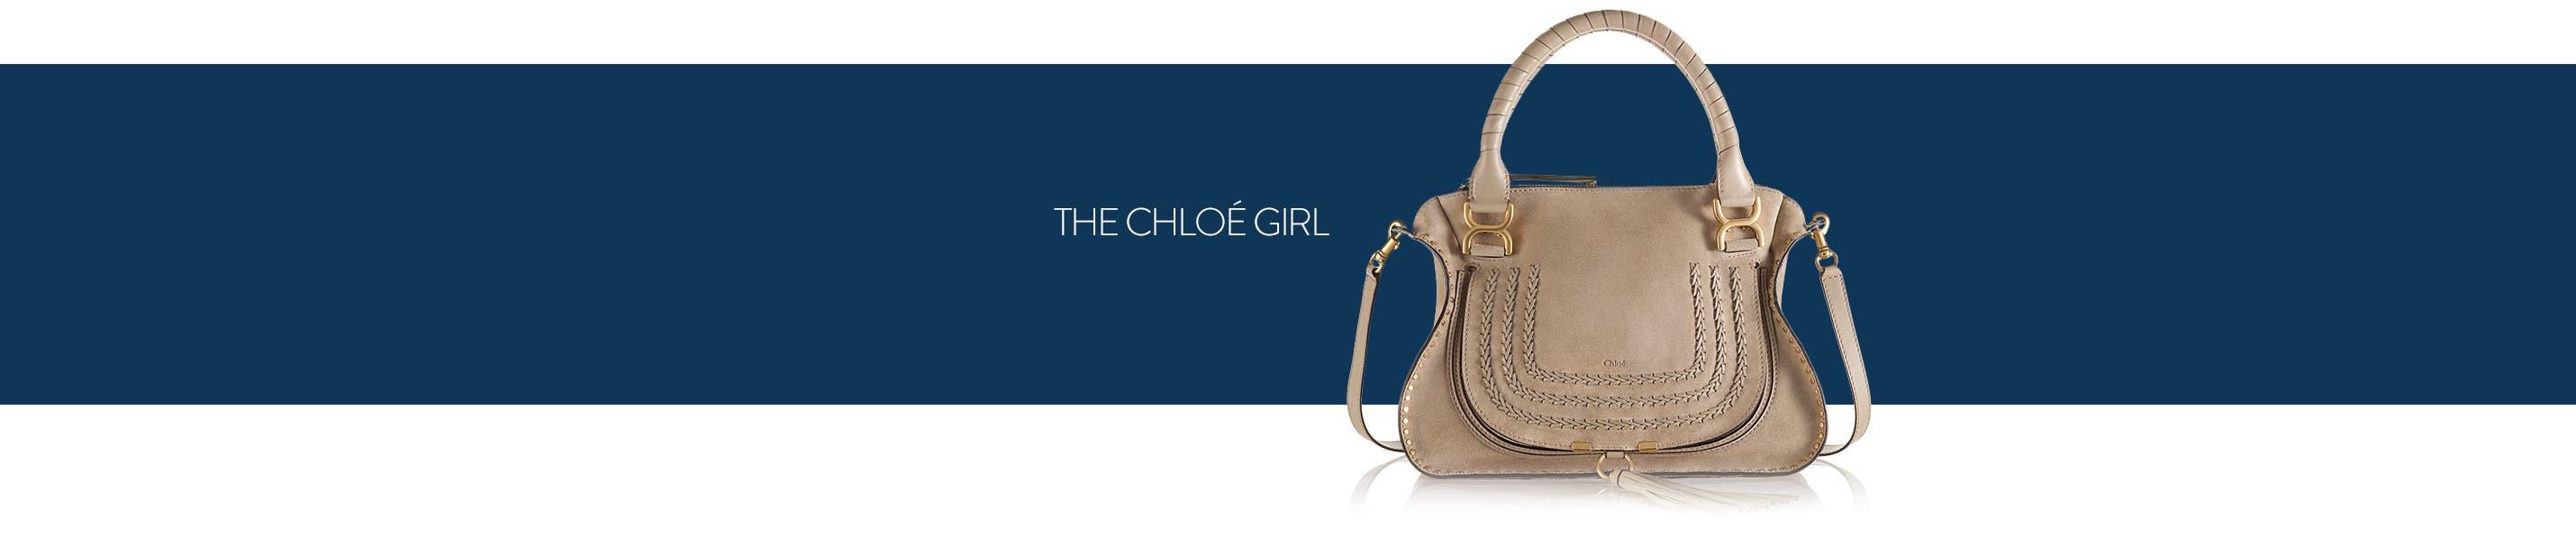 The Chloe girl: handbags.